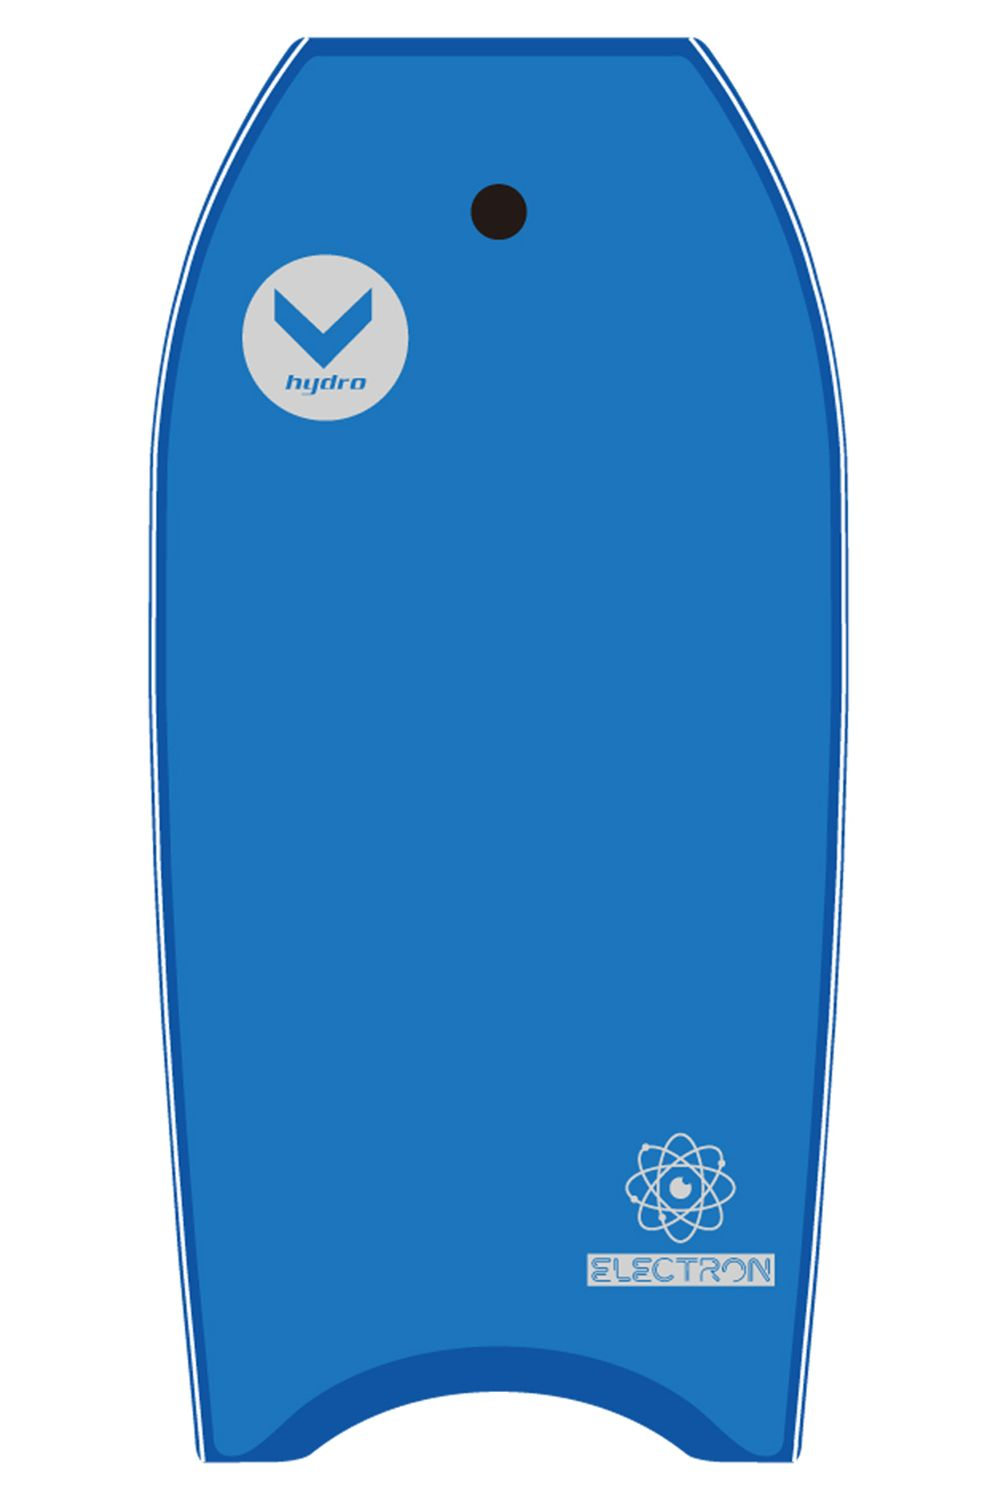 "Hydro Bodyboard Board 40"" HYDRO ELECTRON Light Blue"